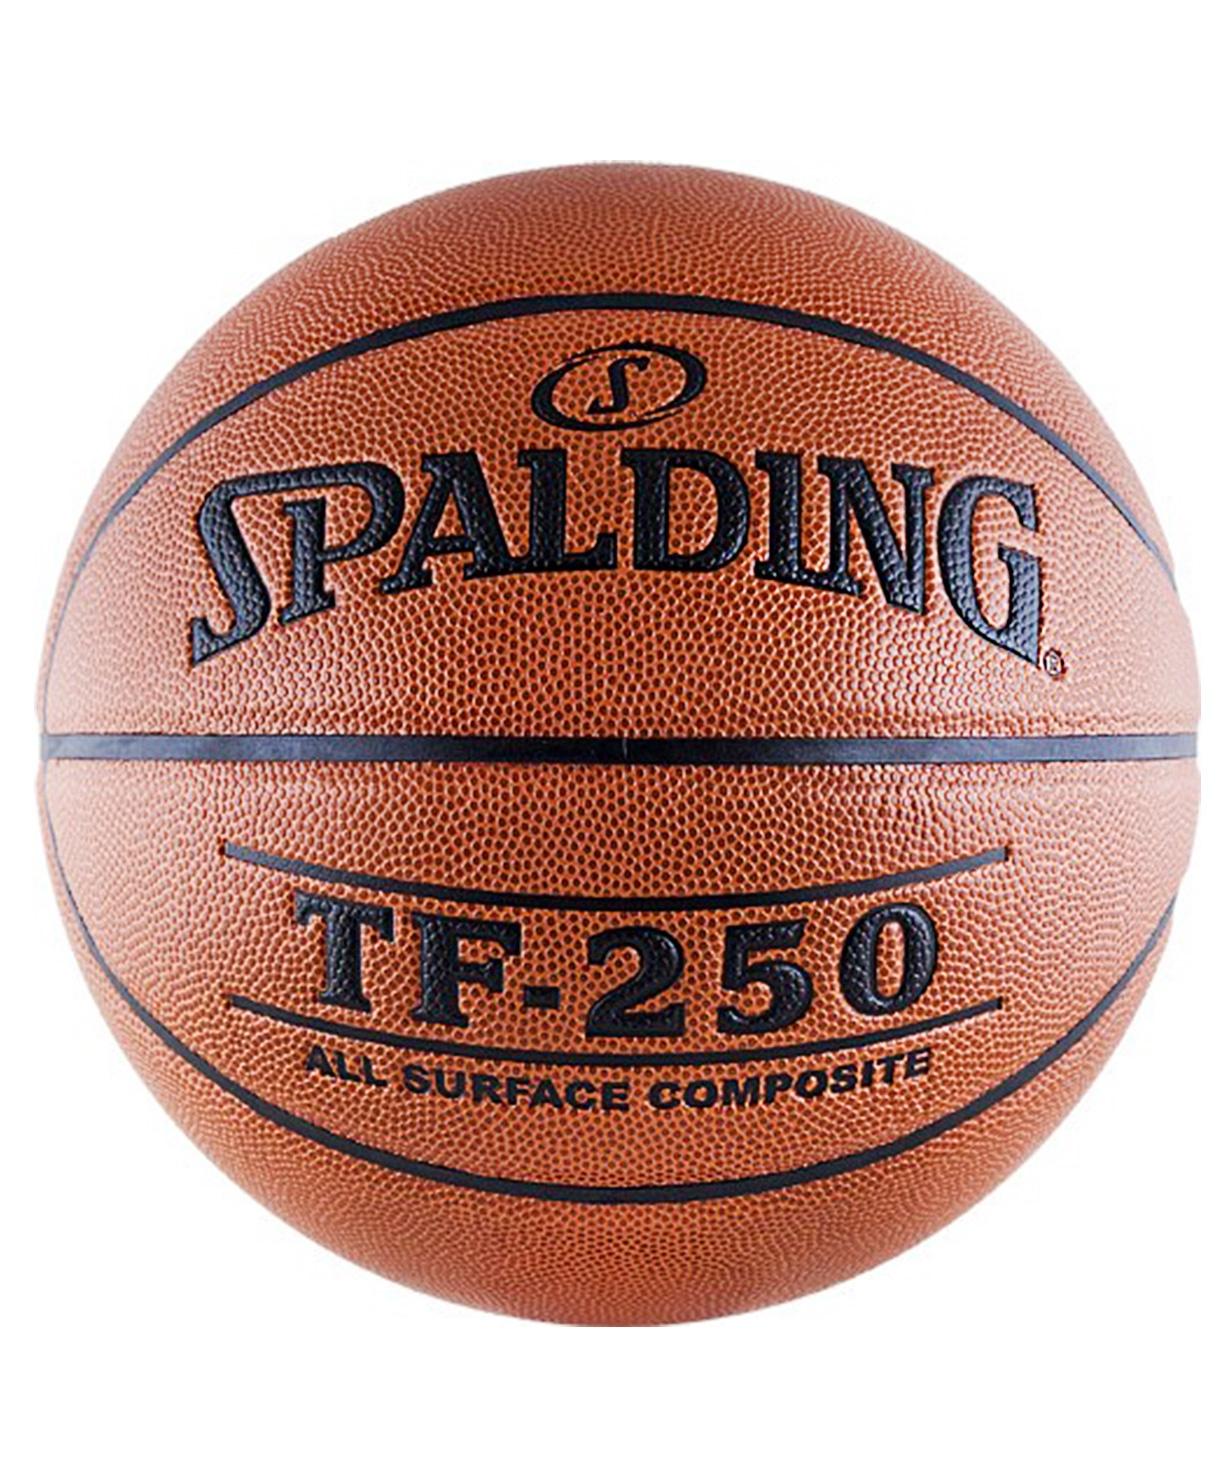 Мяч баскетбольный Spalding TF-250, Размер 7 (74-531) (7)